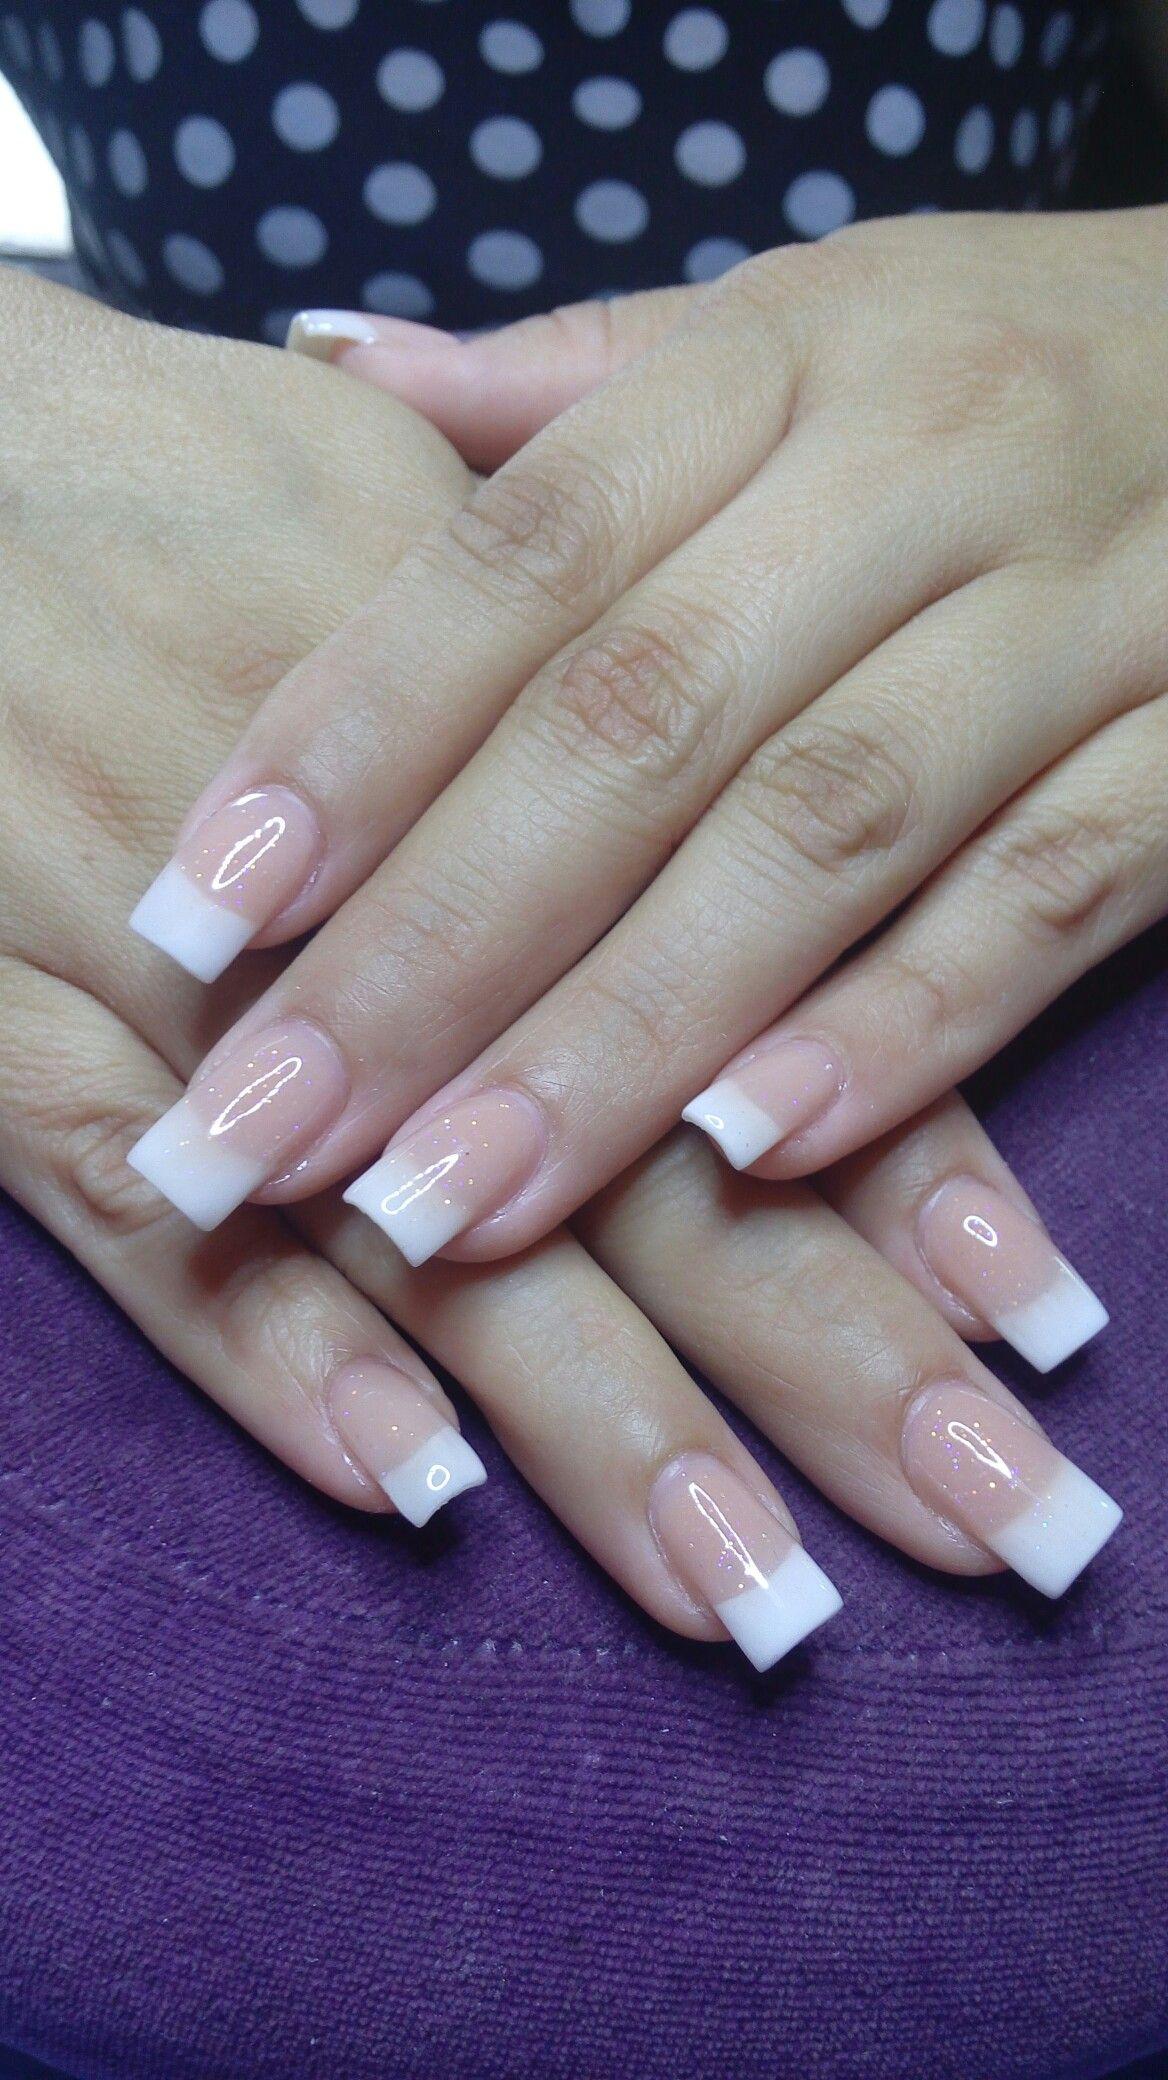 Mina Nails Manicura Y Pedicura Pinterest Uñas Francesas Uña